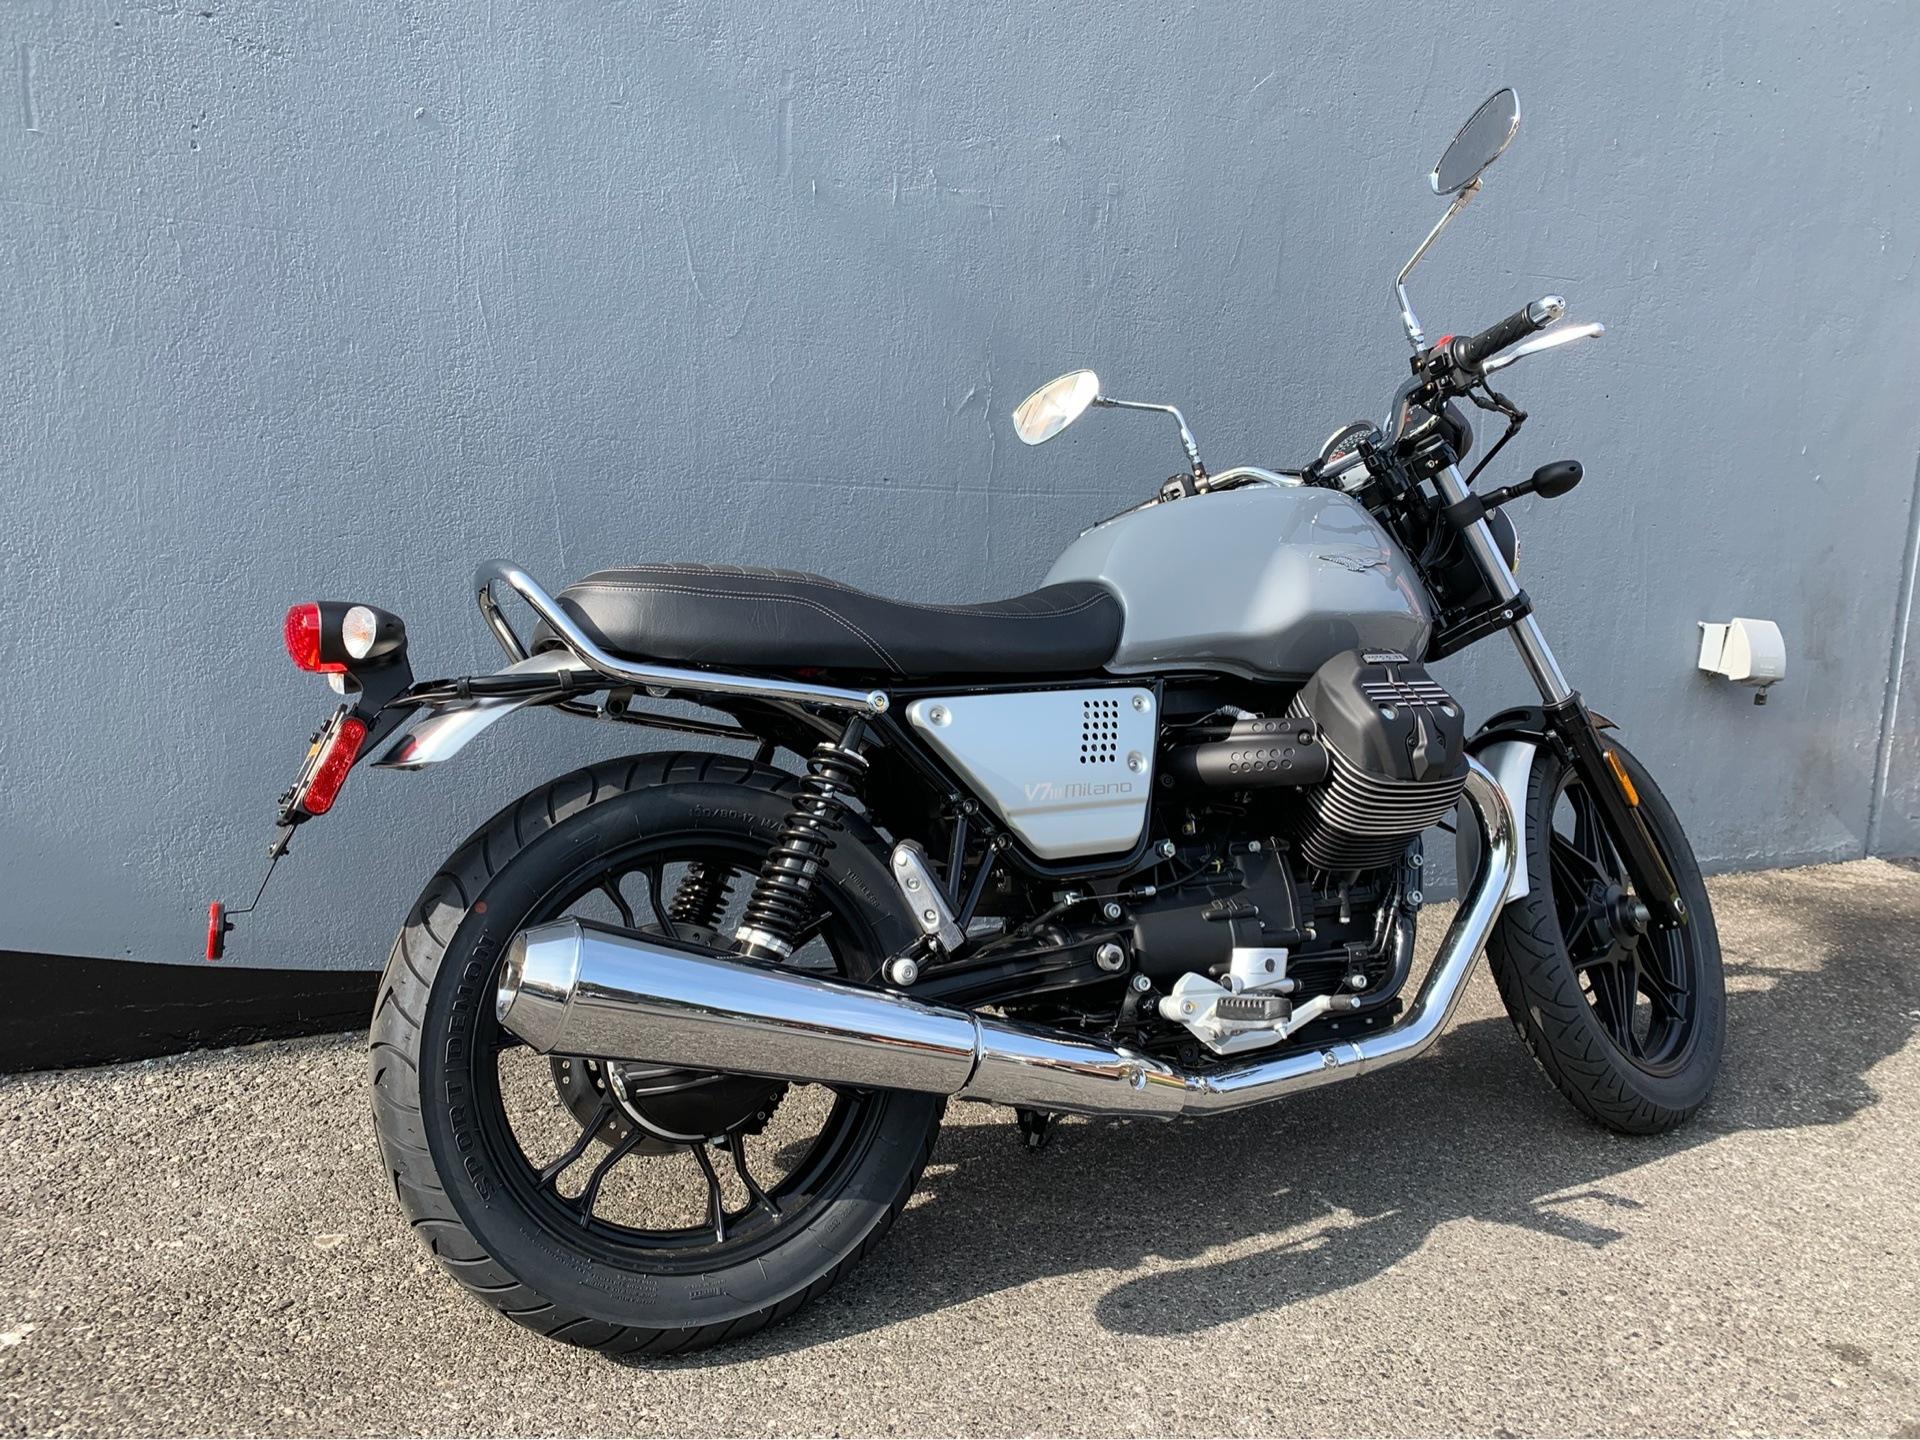 New 2018 Moto Guzzi V7 Iii Milano Motorcycles In San Jose Ca